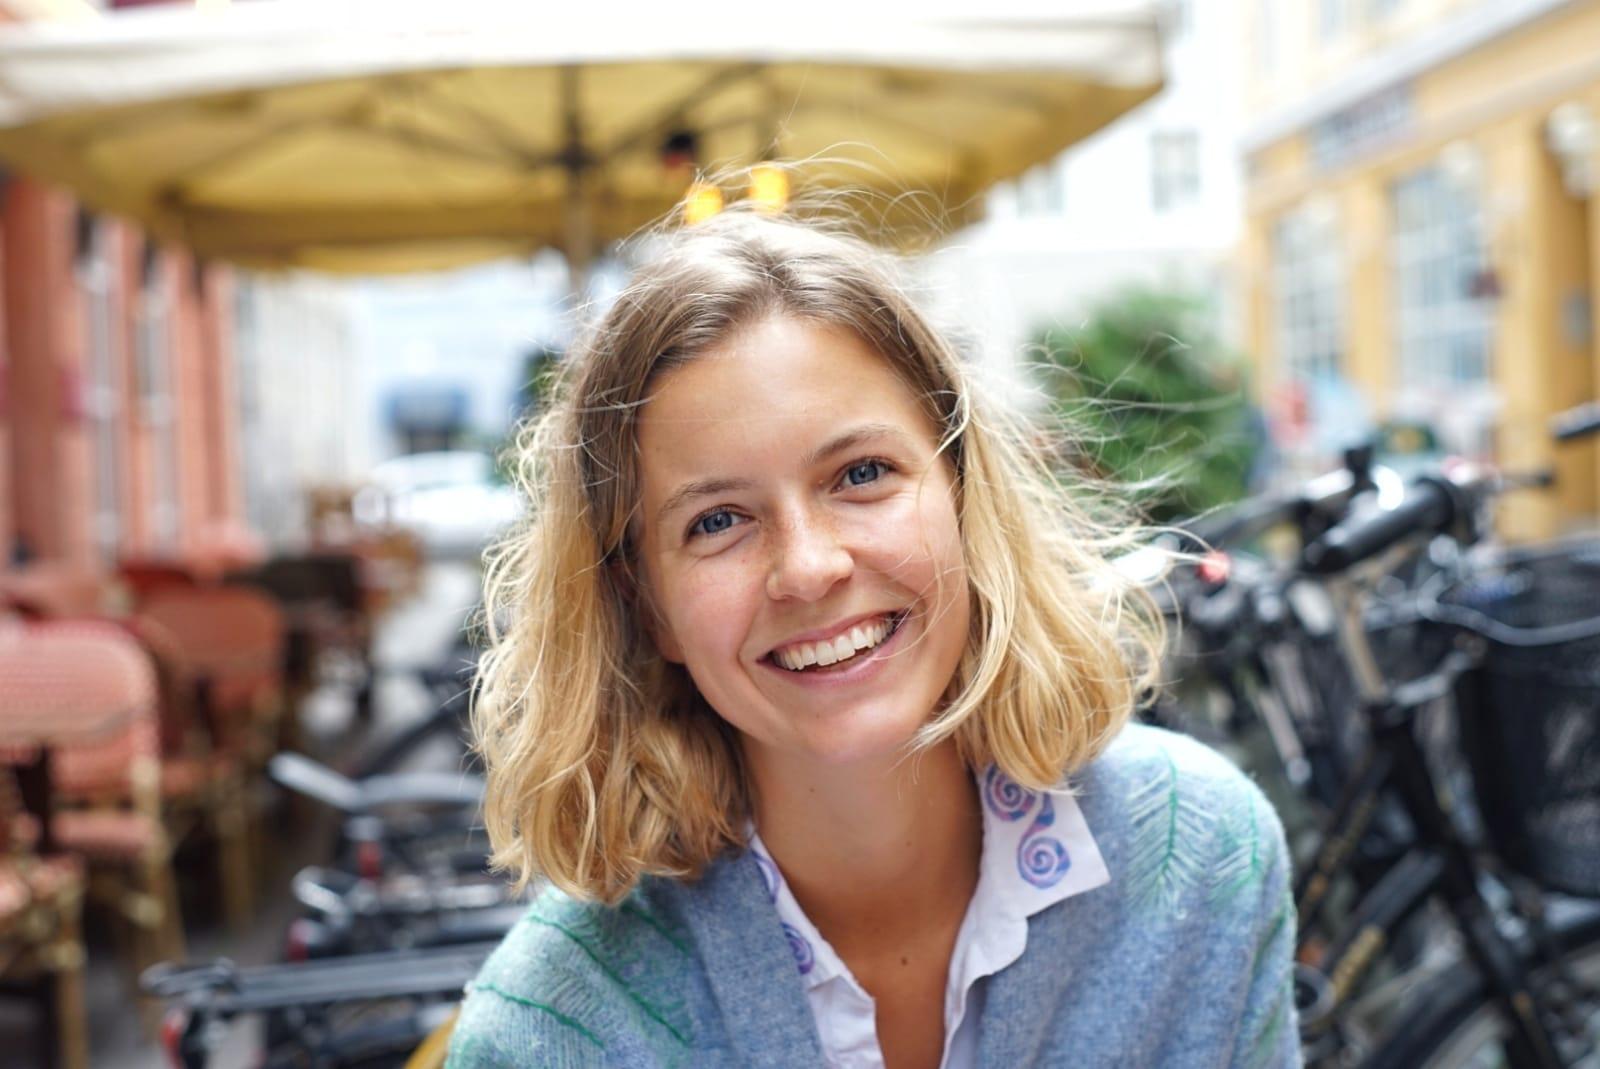 Elin-Petronells-Profile-Pic